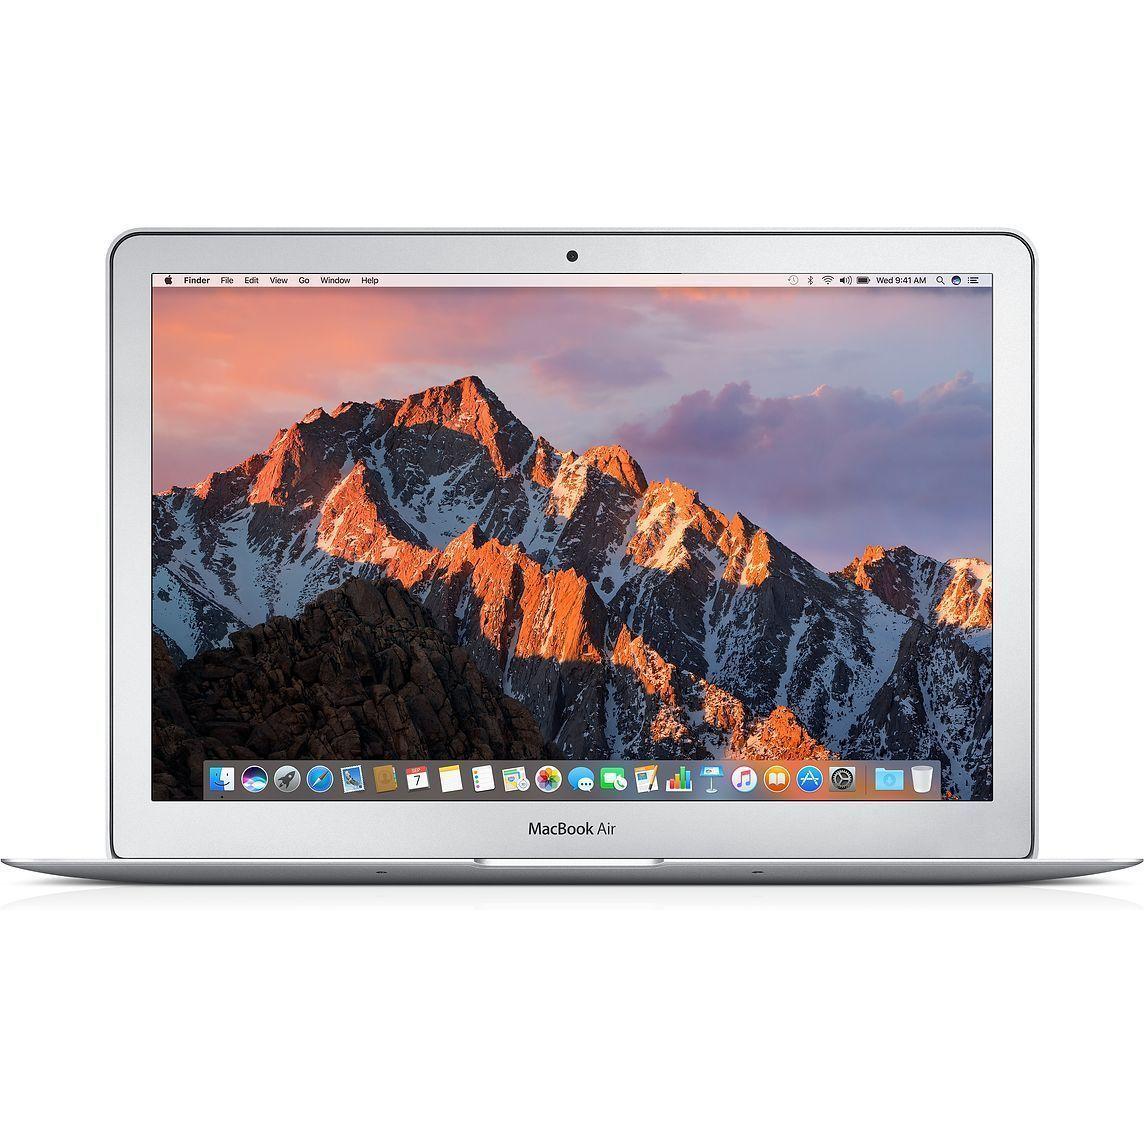 Reformiert 13 3 Zoll Macbook Air 1 8 Ghz Dual Core Intel Core I5 Apfel In 2020 Apple Macbook Macbook Air Macbook Air Laptop